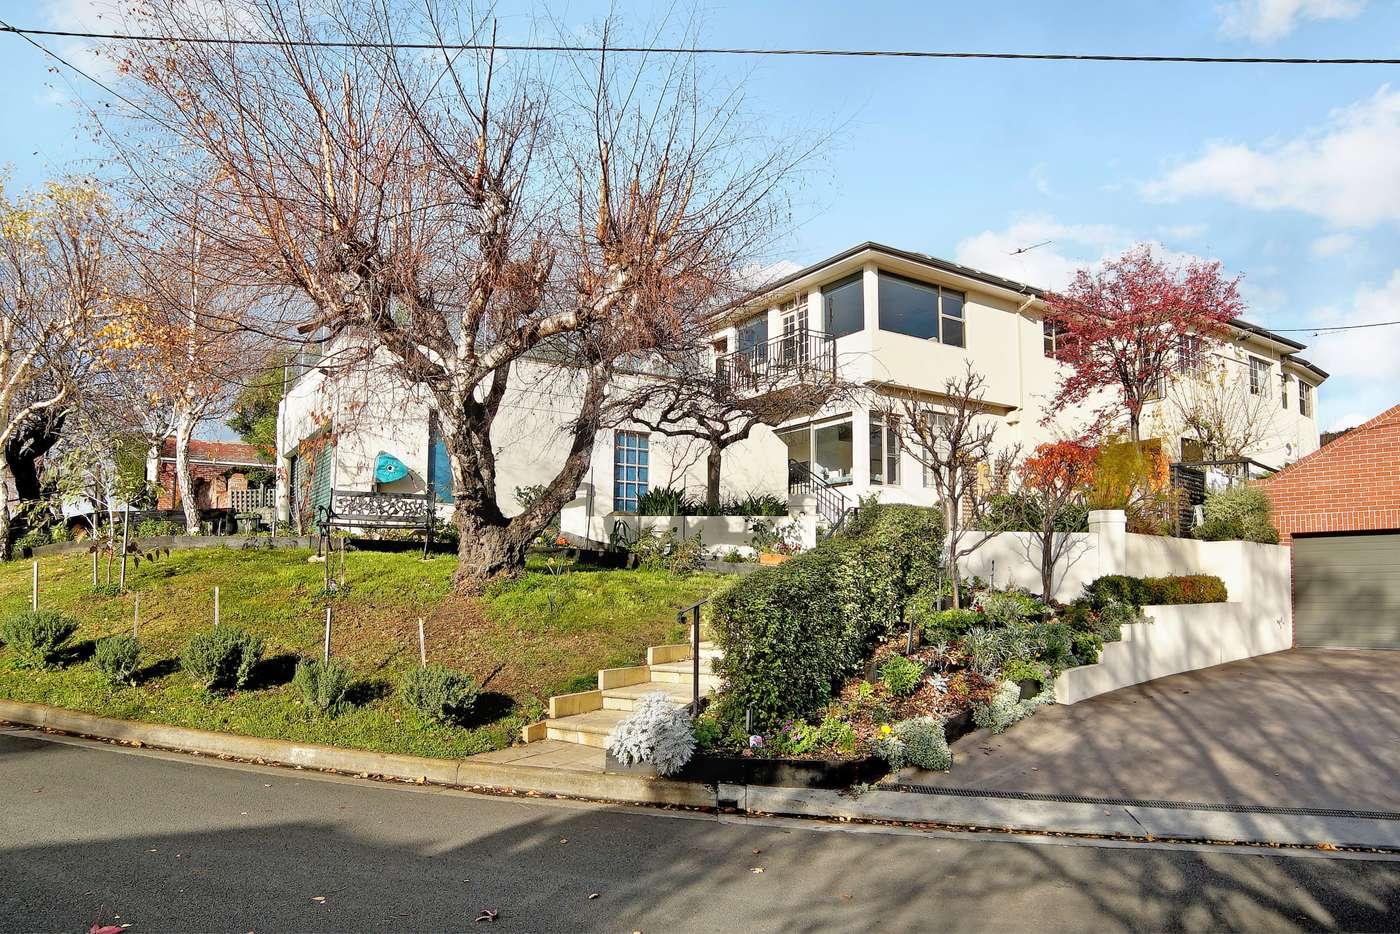 Main view of Homely house listing, 5 Ellington Road, Sandy Bay TAS 7005